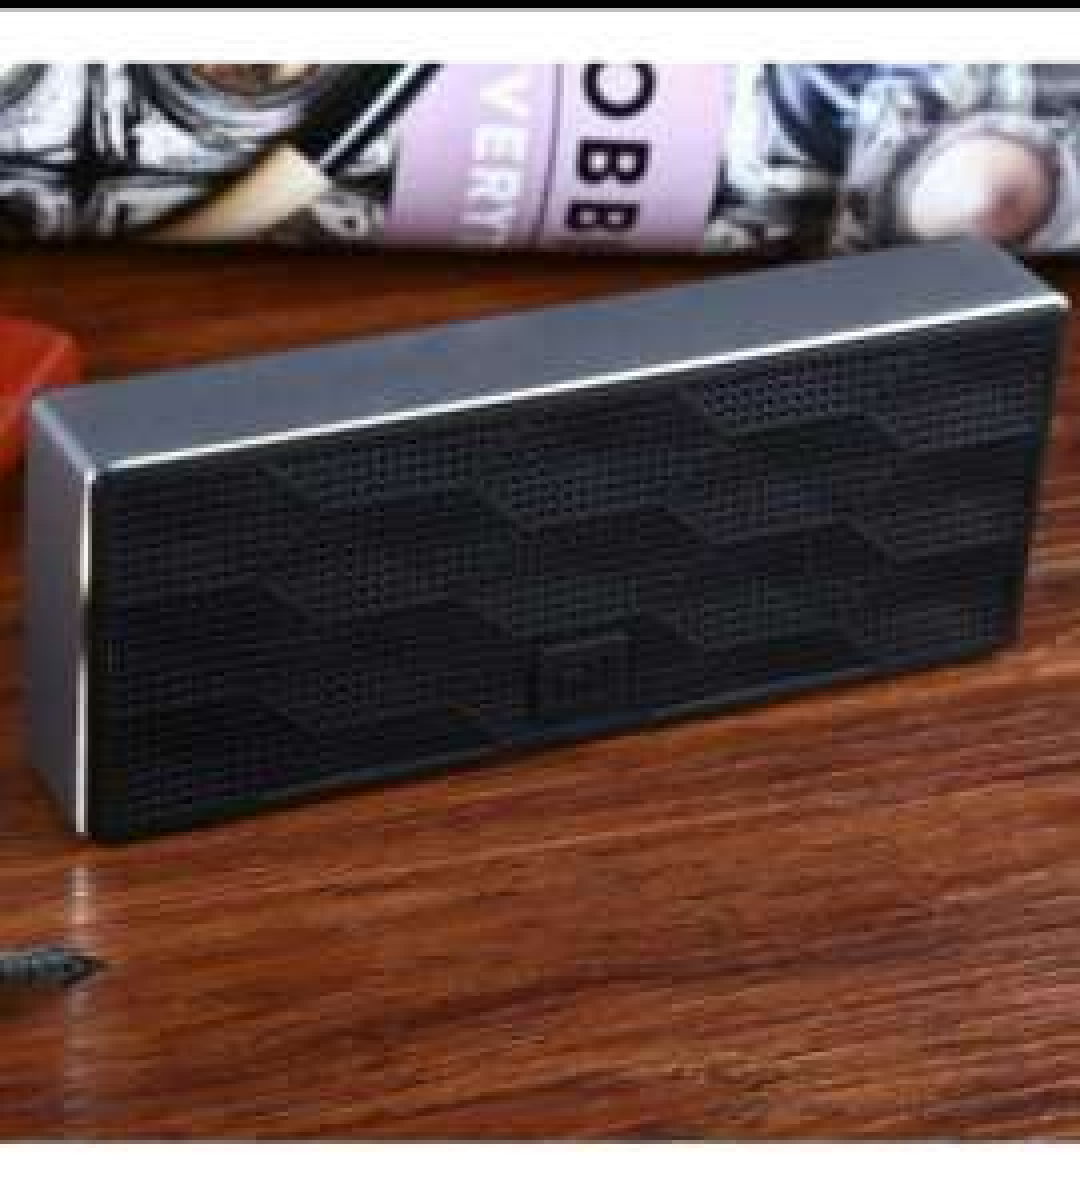 [GEARBEST] Originale Xiaomi Bluetooth 4.0 Lautsprecher